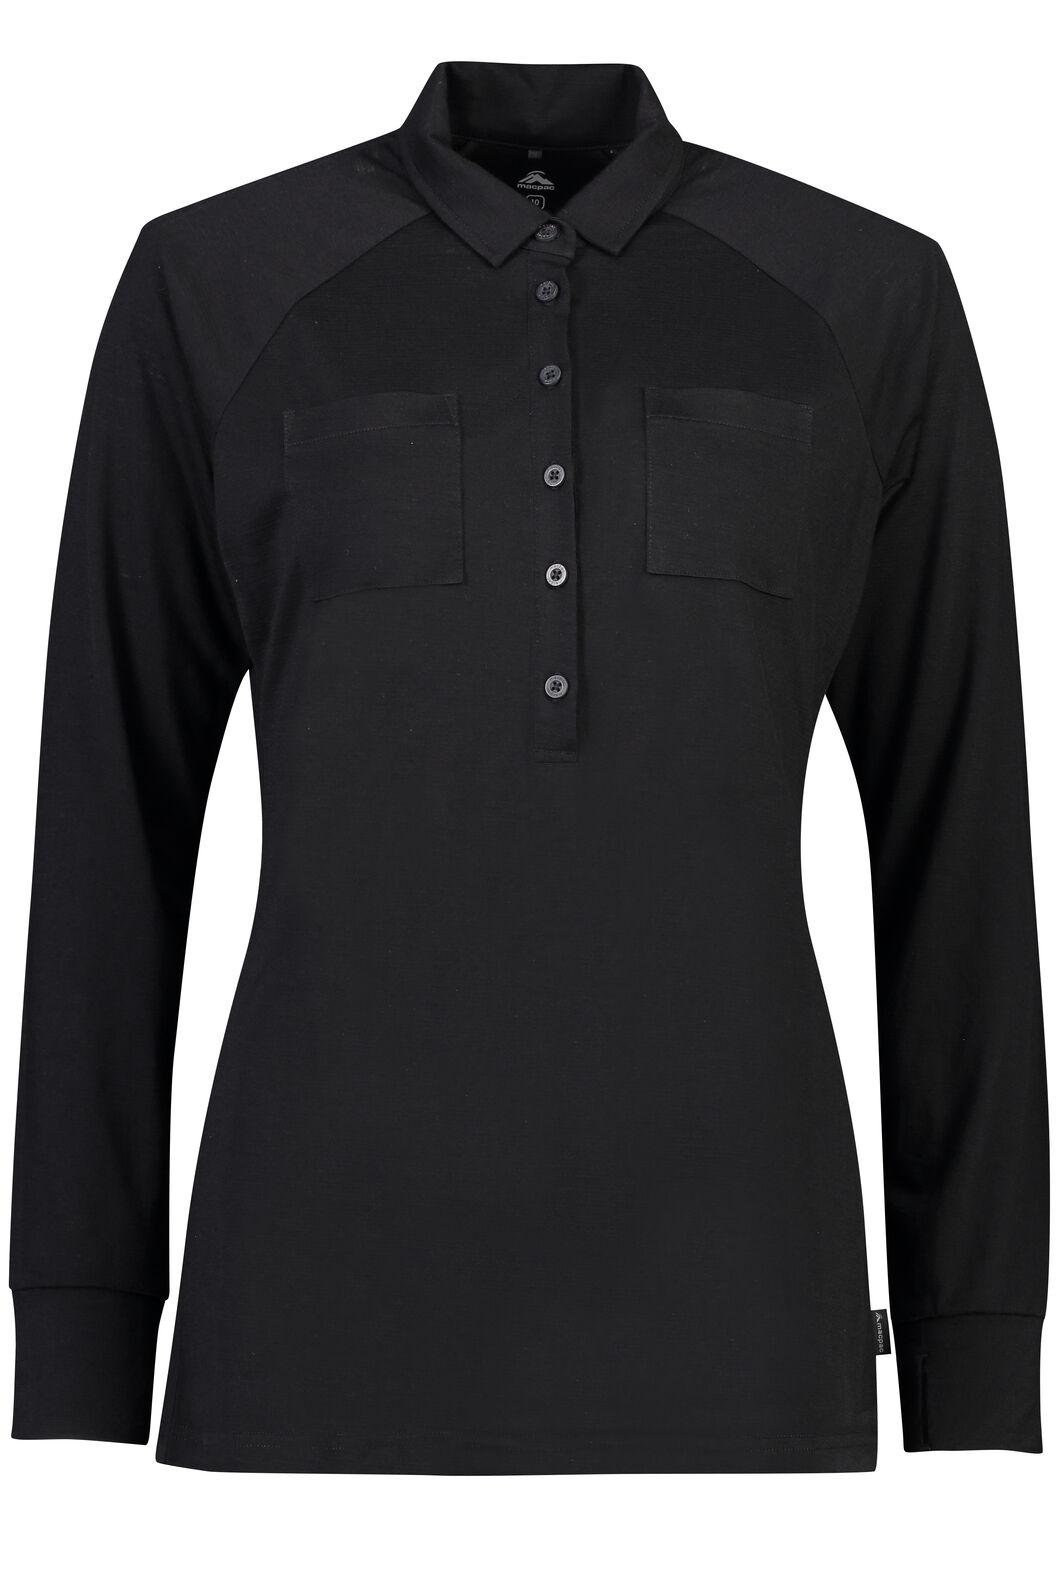 Macpac Rove Merino Blend Long Sleeve - Women's, Black, hi-res